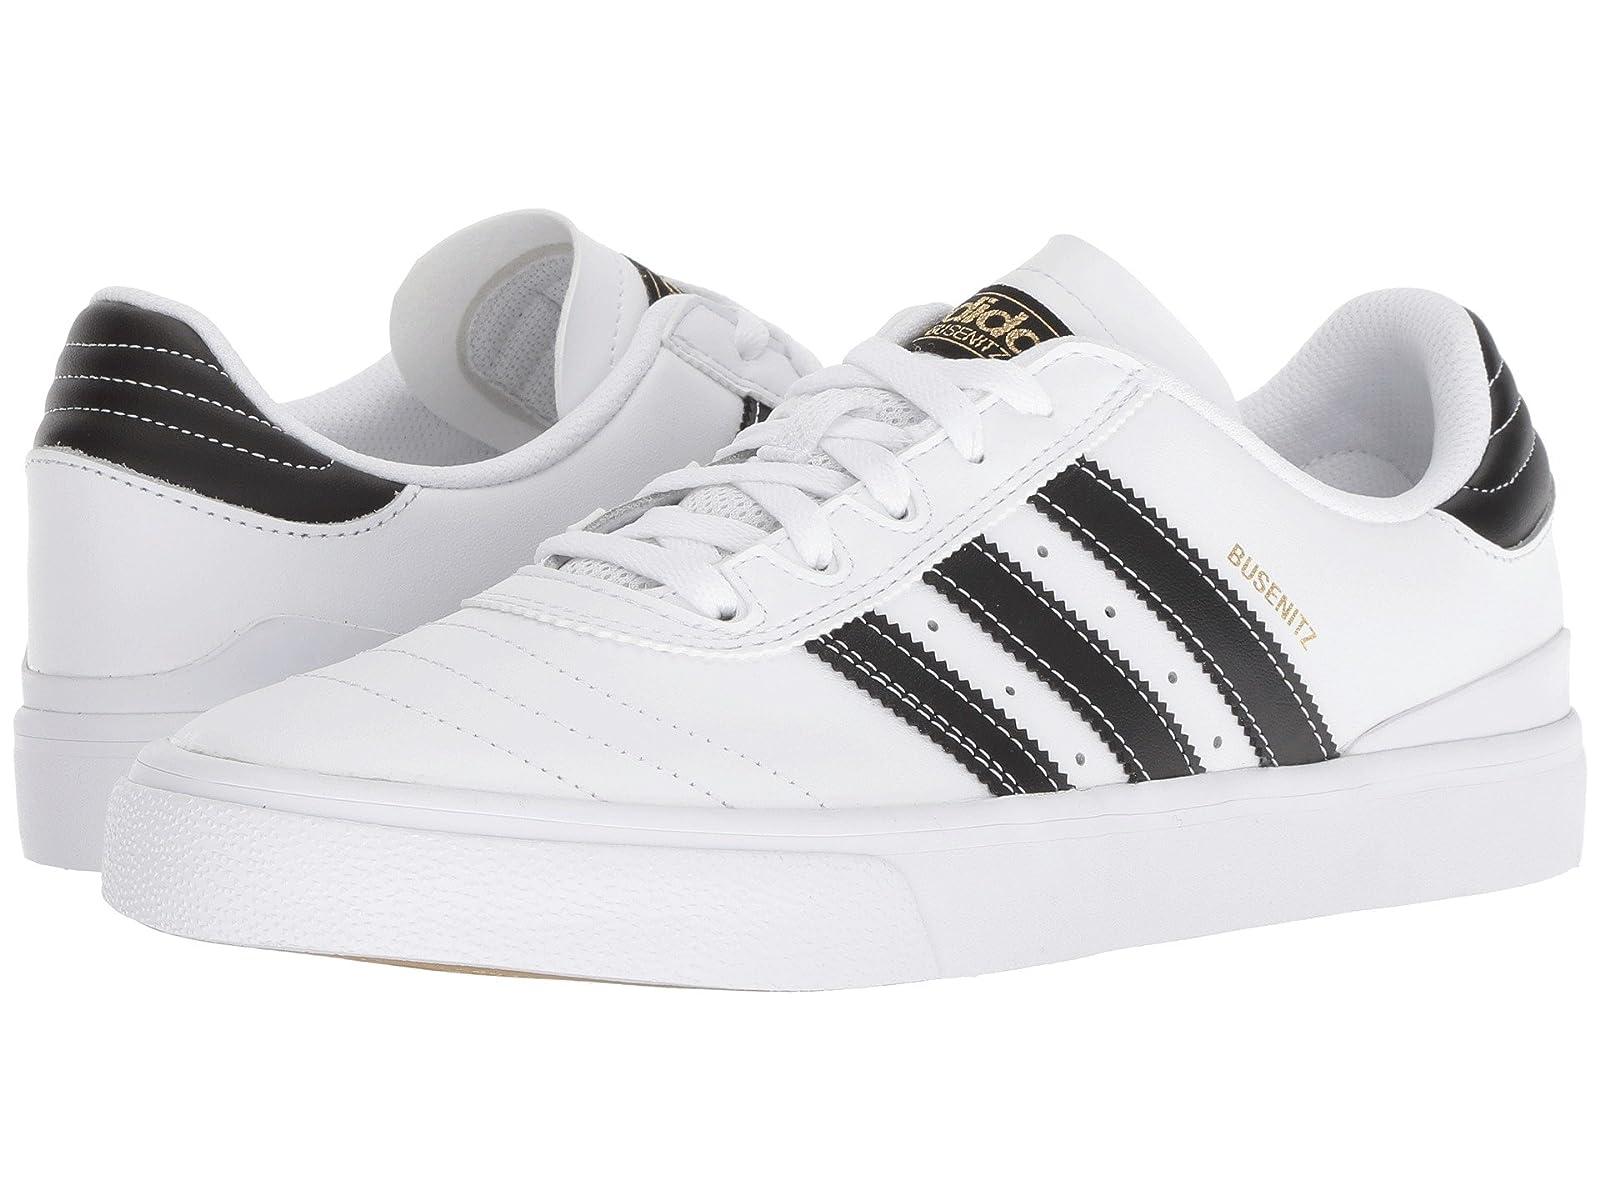 adidas Skateboarding Busenitz VulcAtmospheric grades have affordable shoes